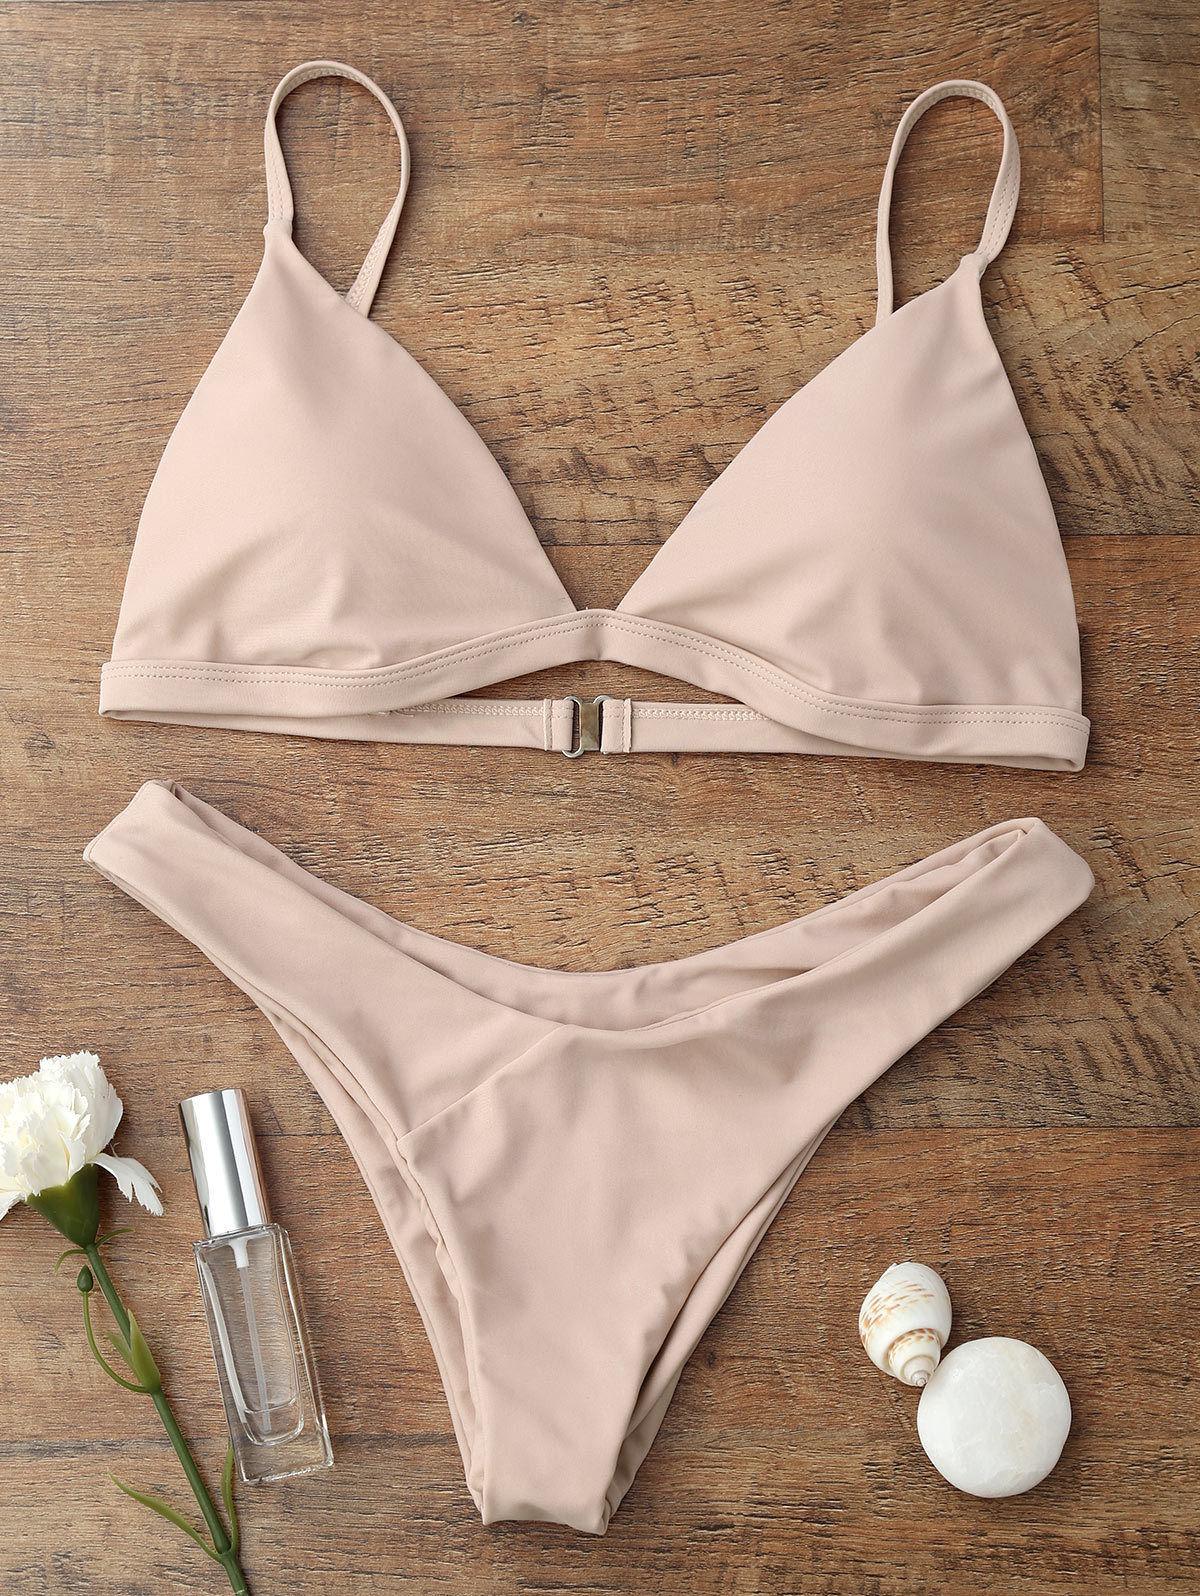 Summer Womens Padded Push-up Bikini Set Swimsuit Bathing Suit Swimwear Beachwear